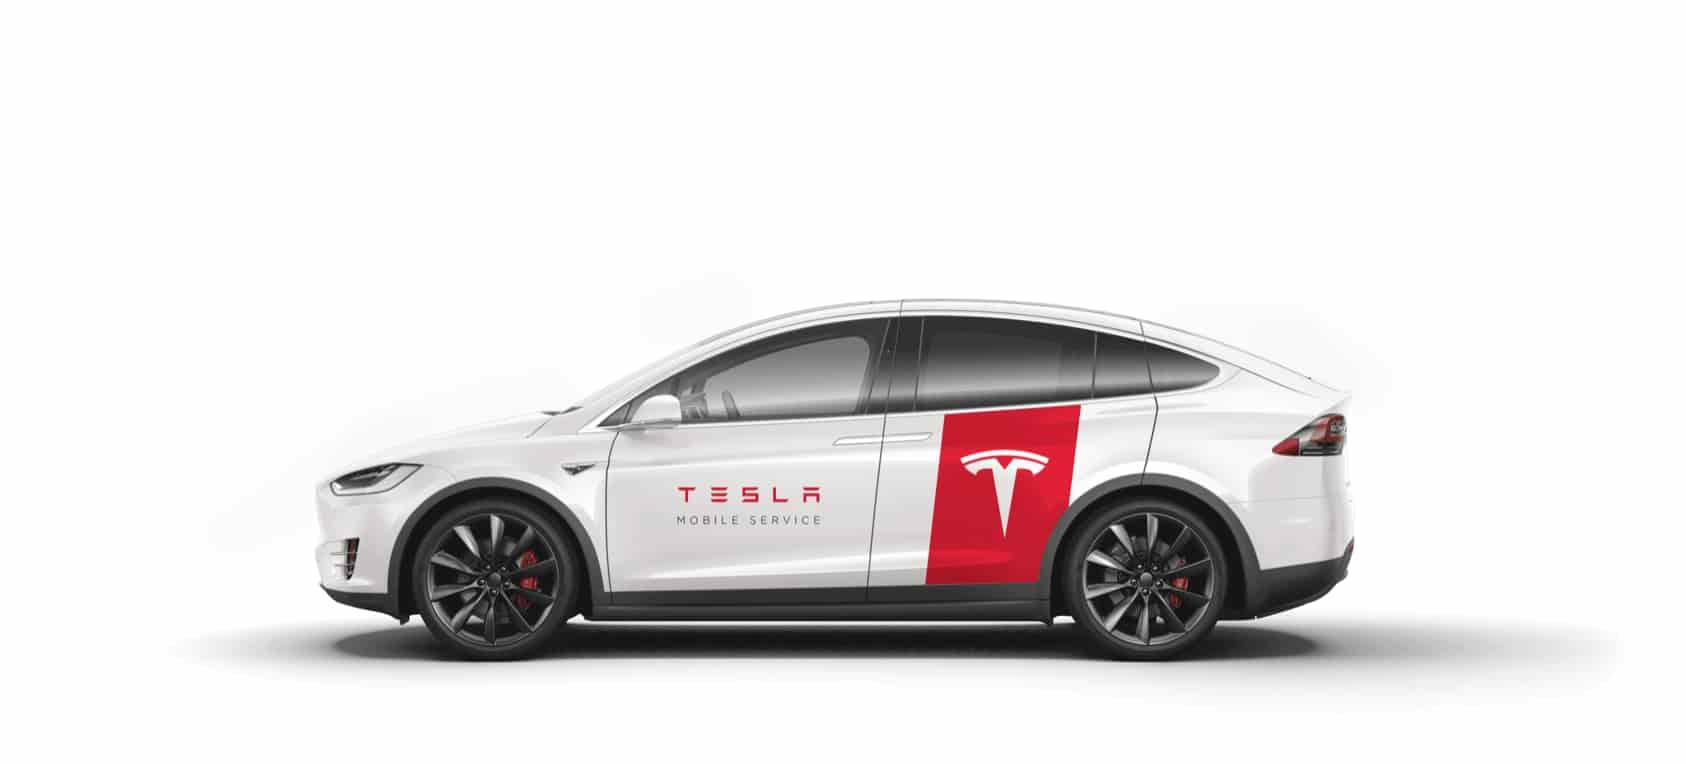 Tesla service vehicle